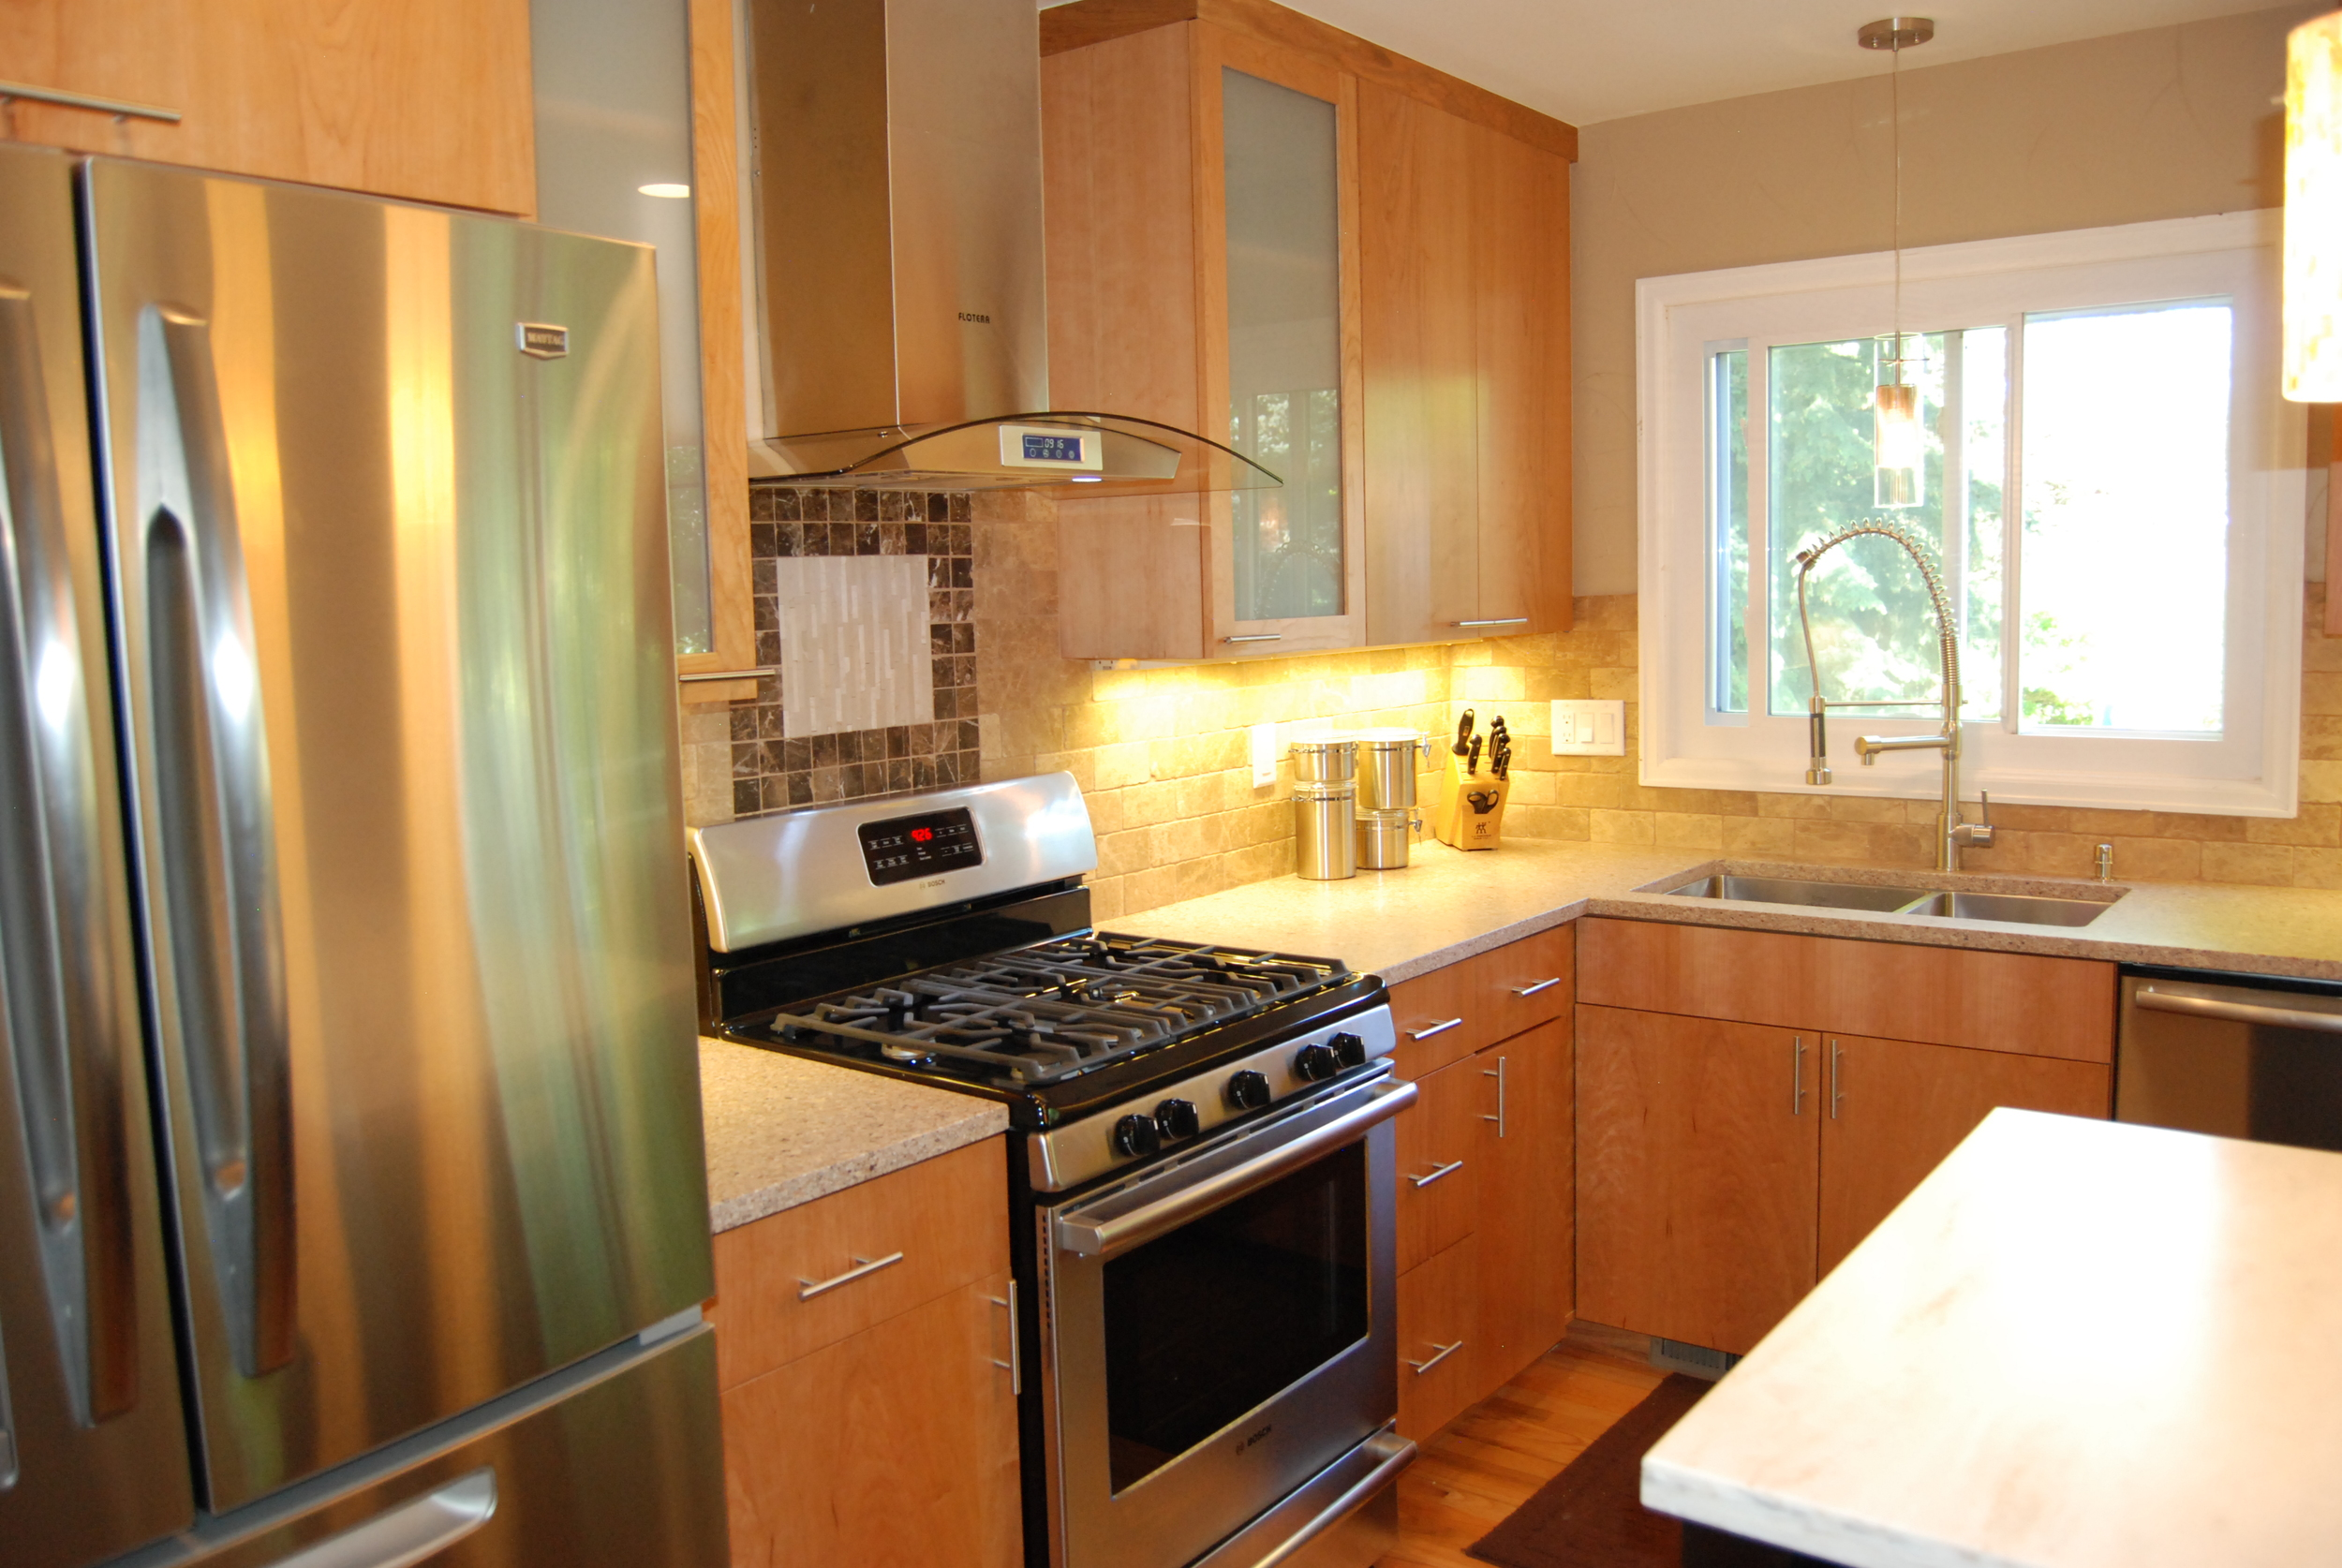 kitchens 04.jpg